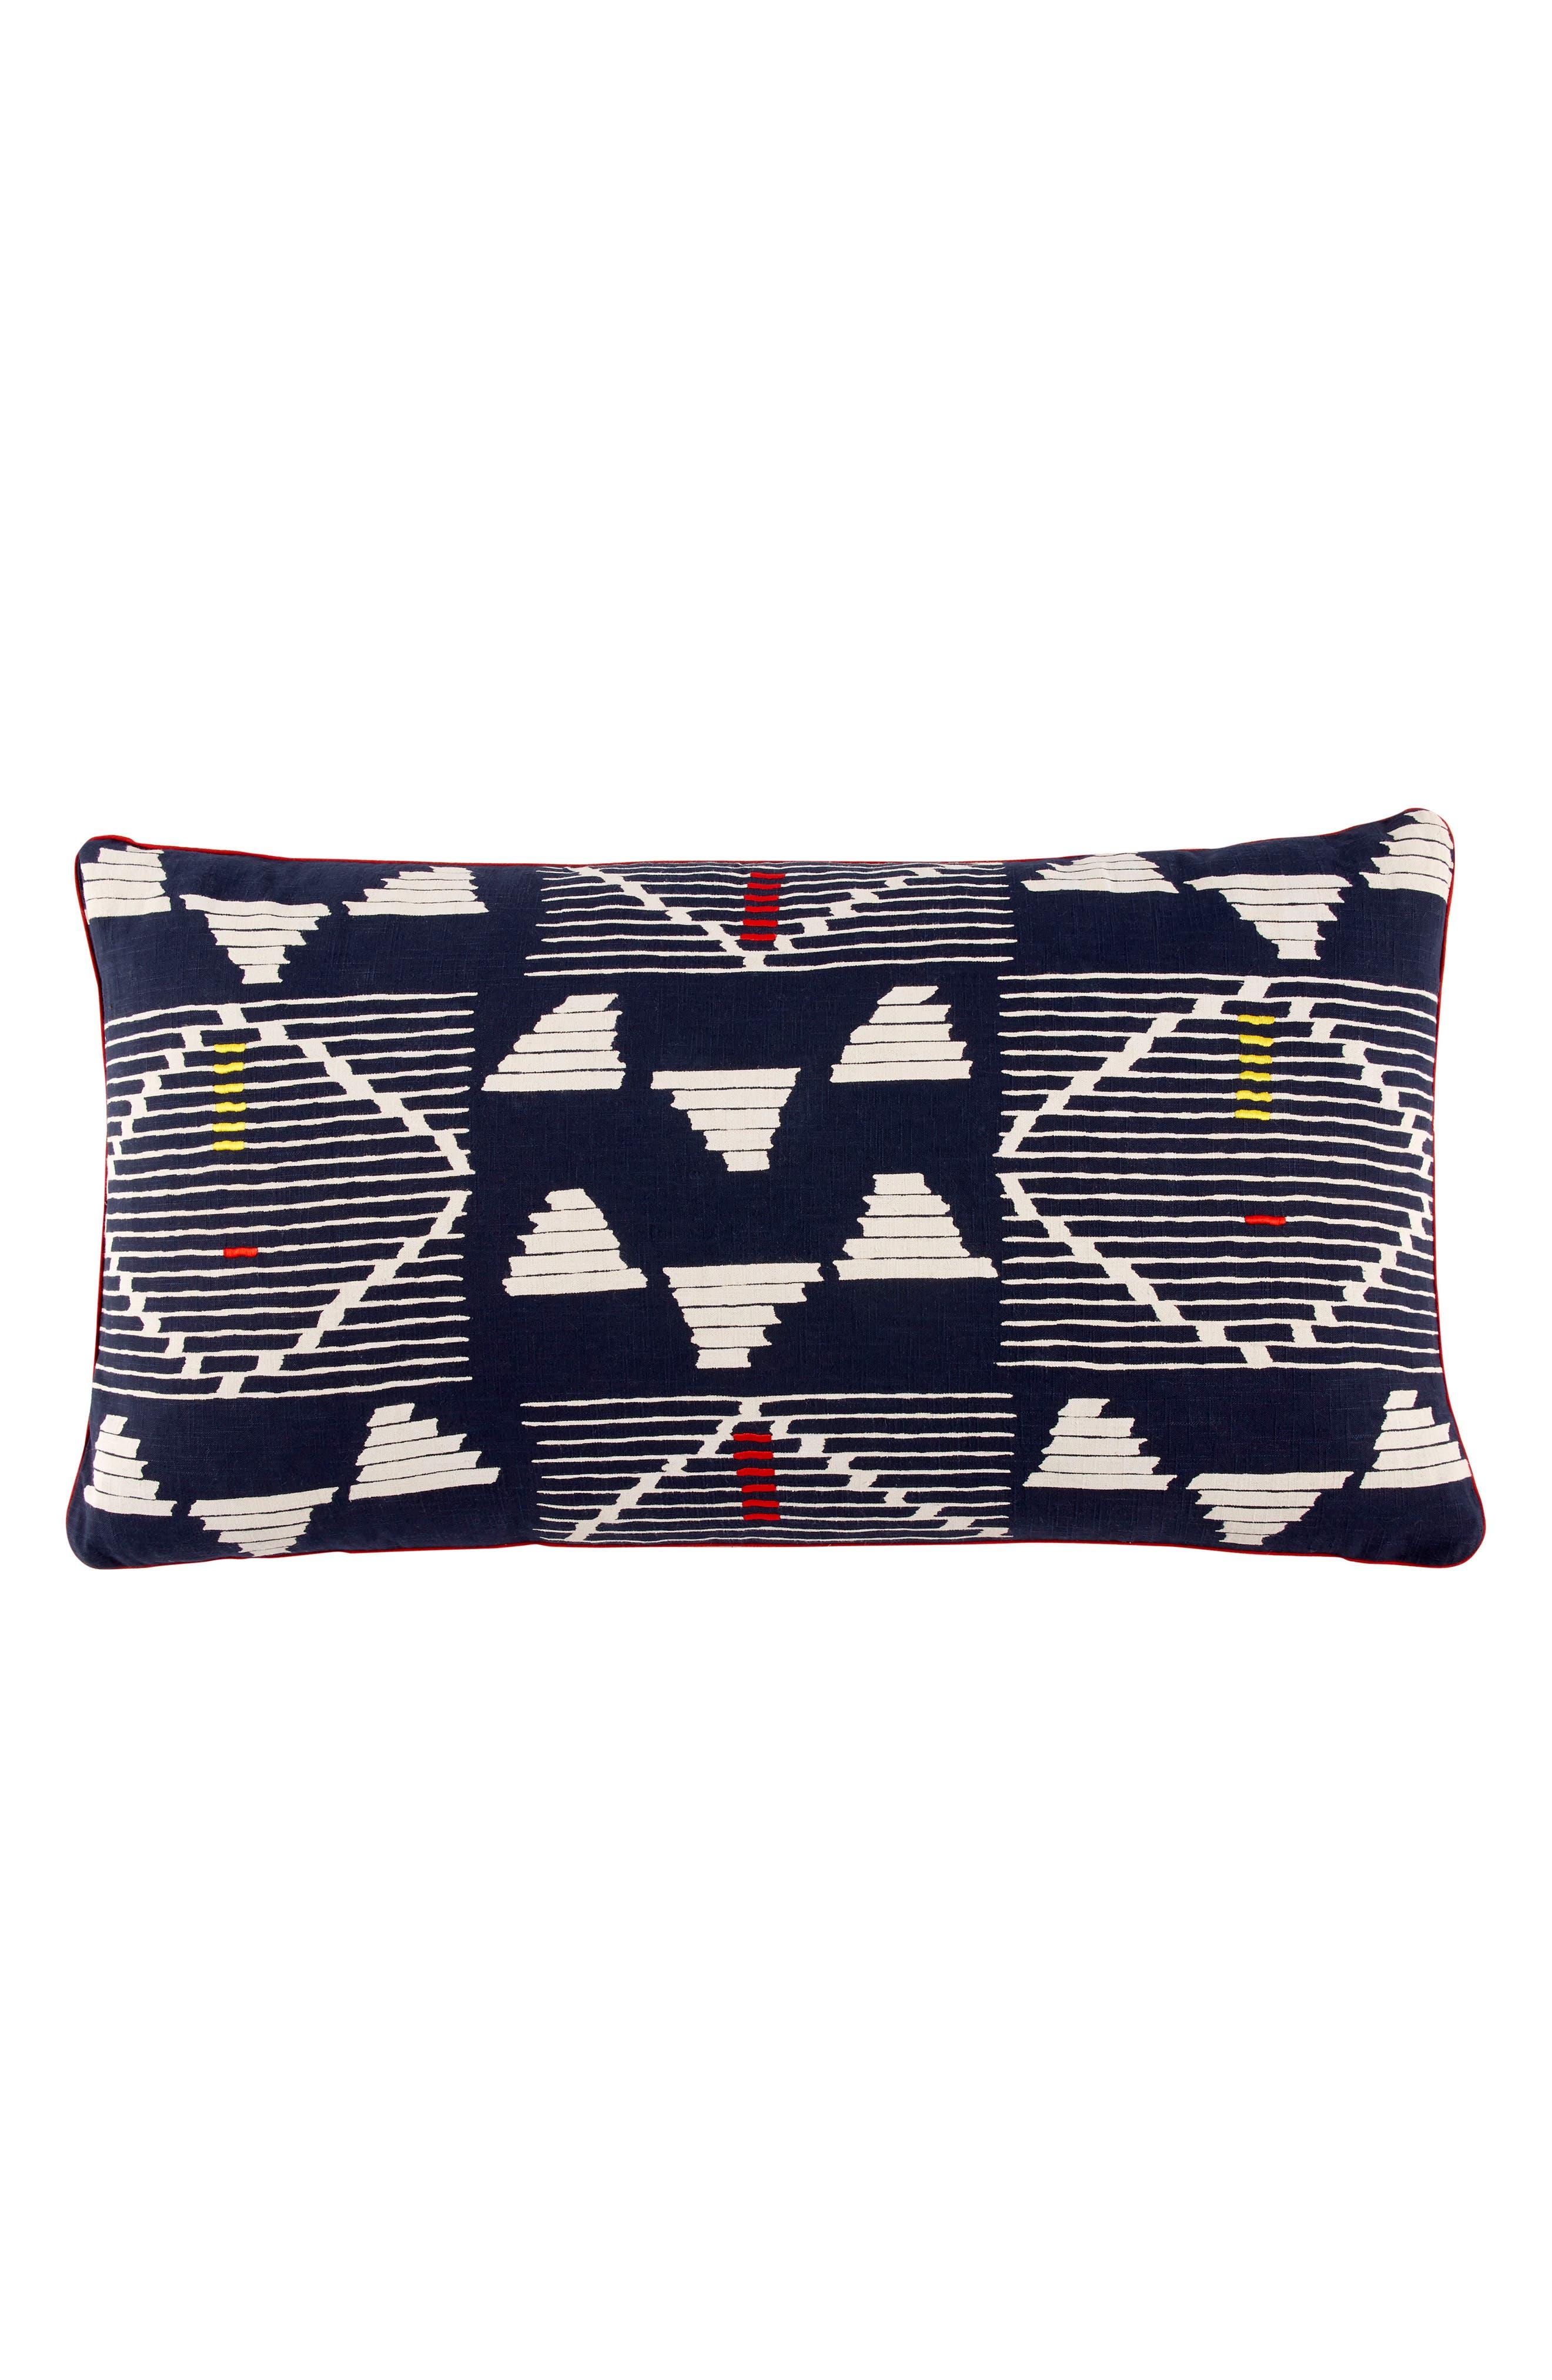 John Robshaw Kambu Bolster Decorative Pillow